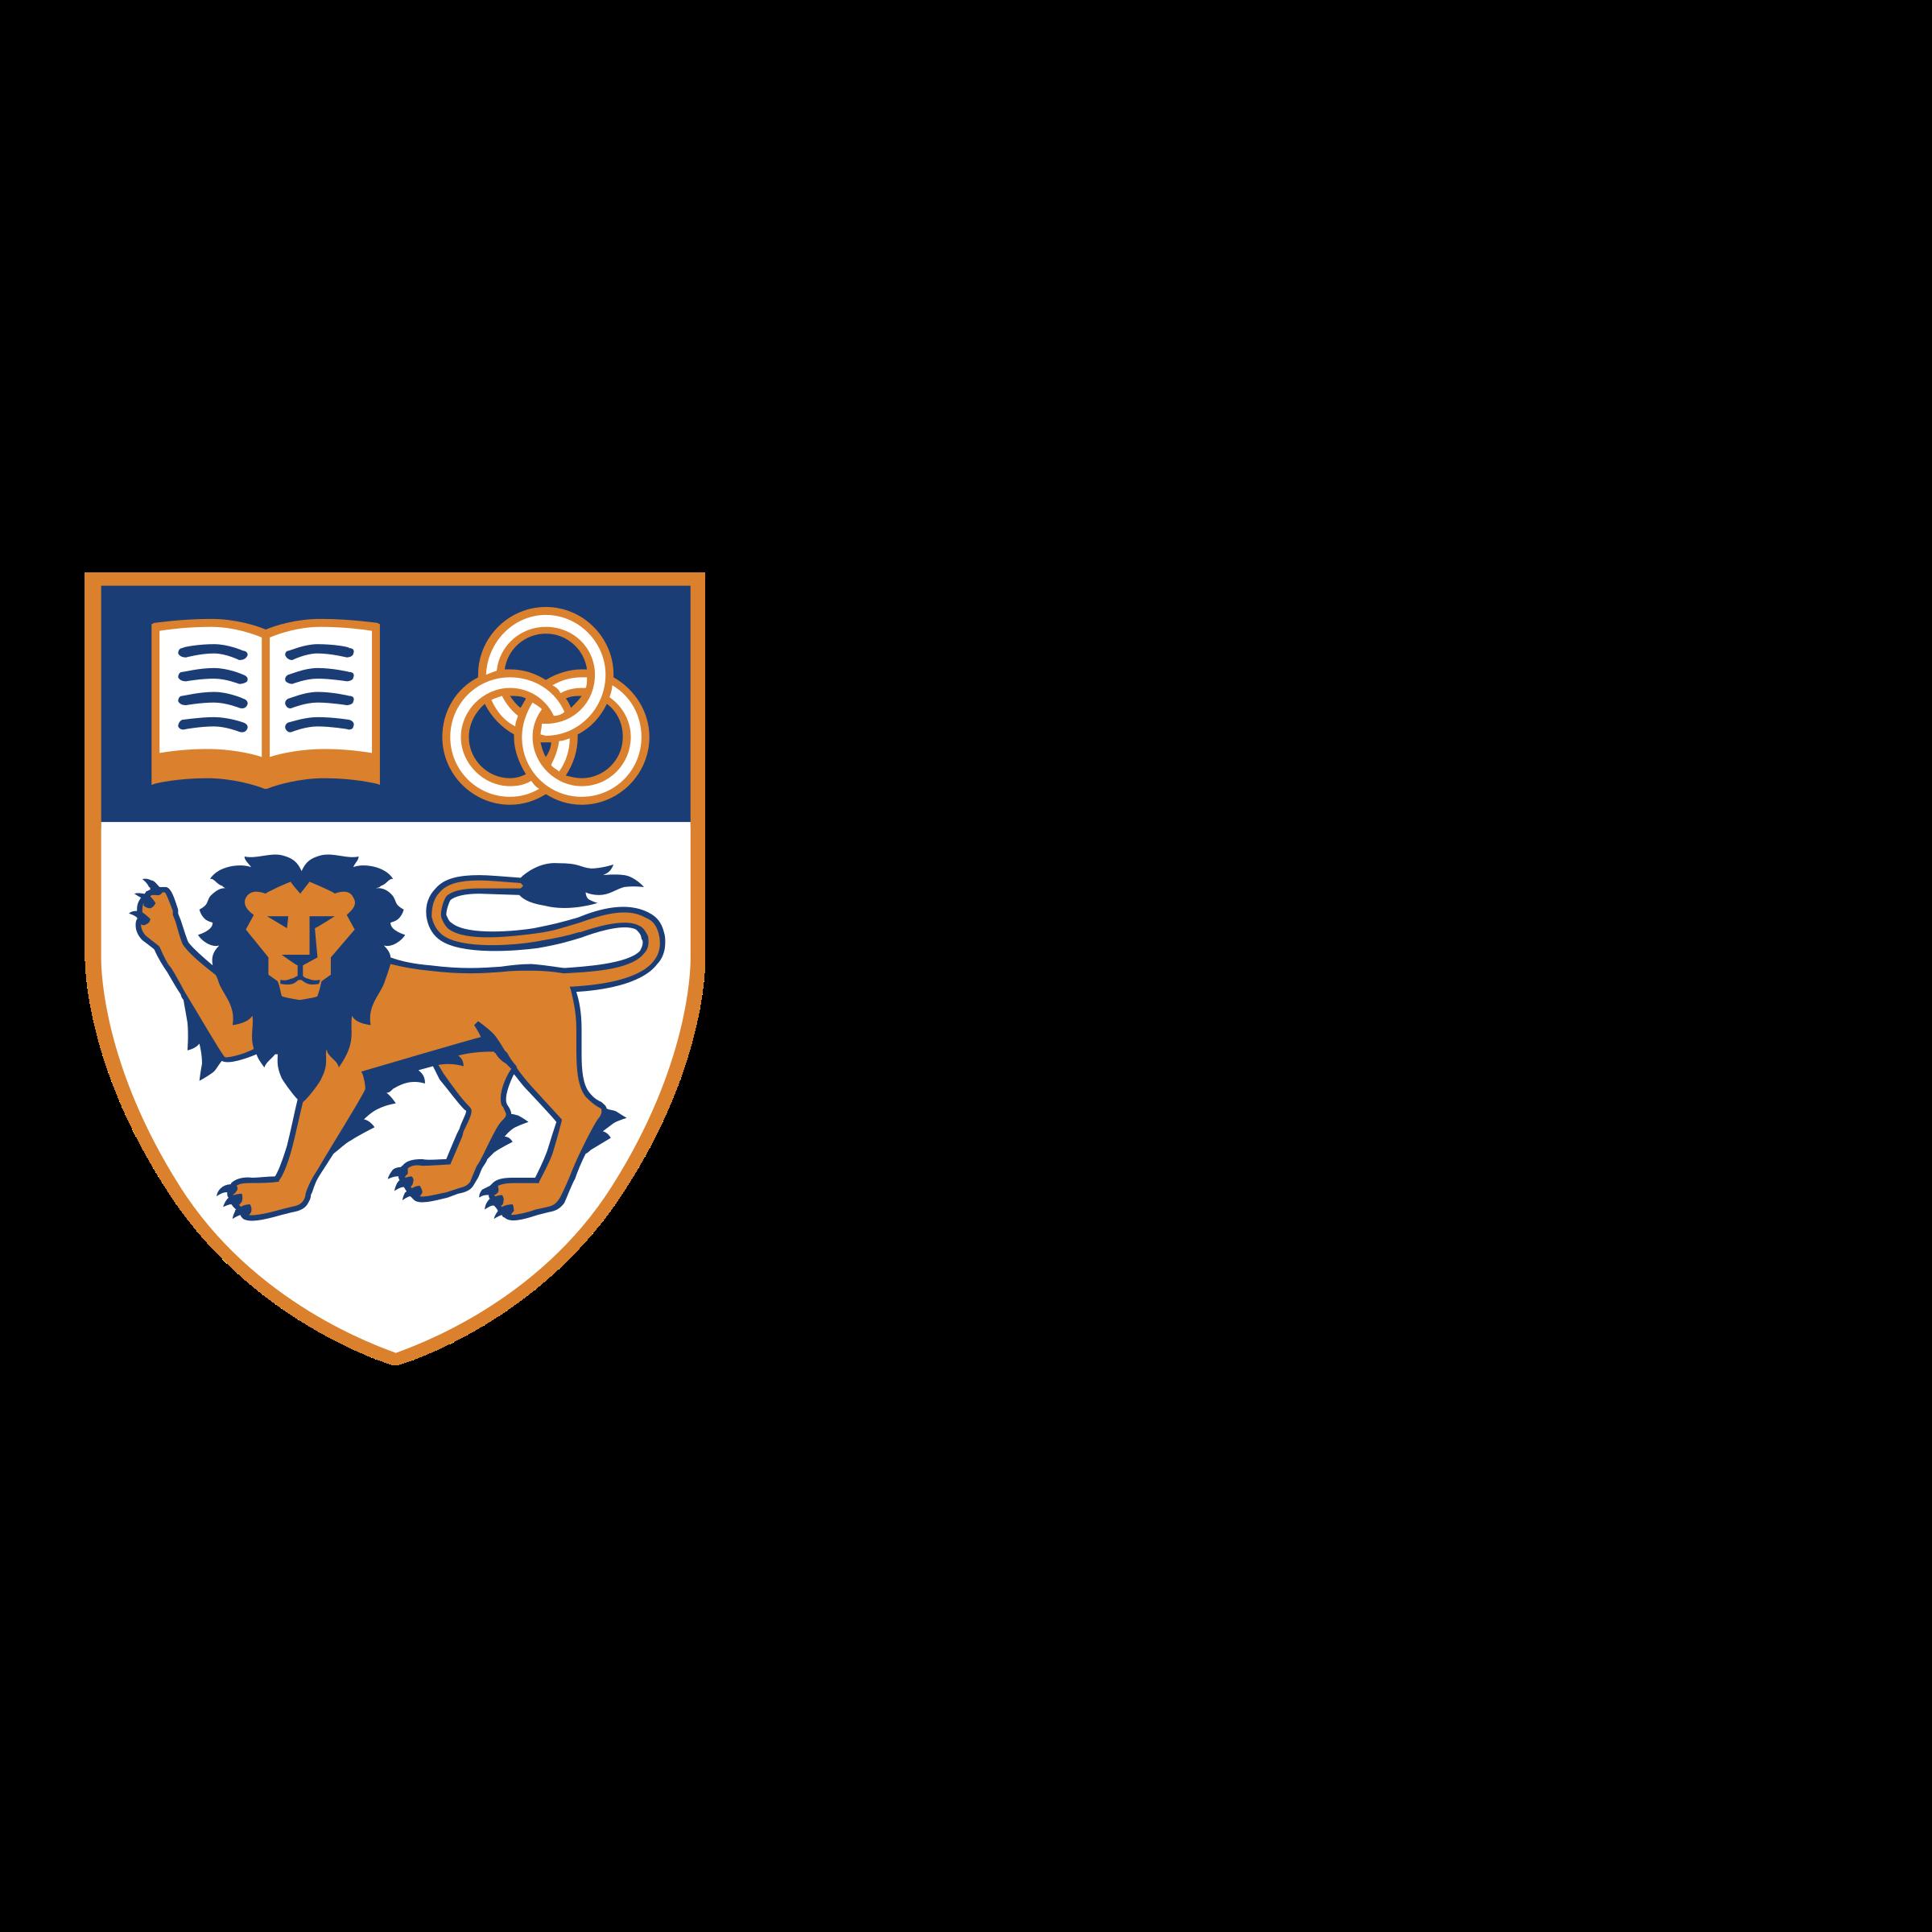 NUS Logo PNG Transparent & SVG Vector - Freebie Supply